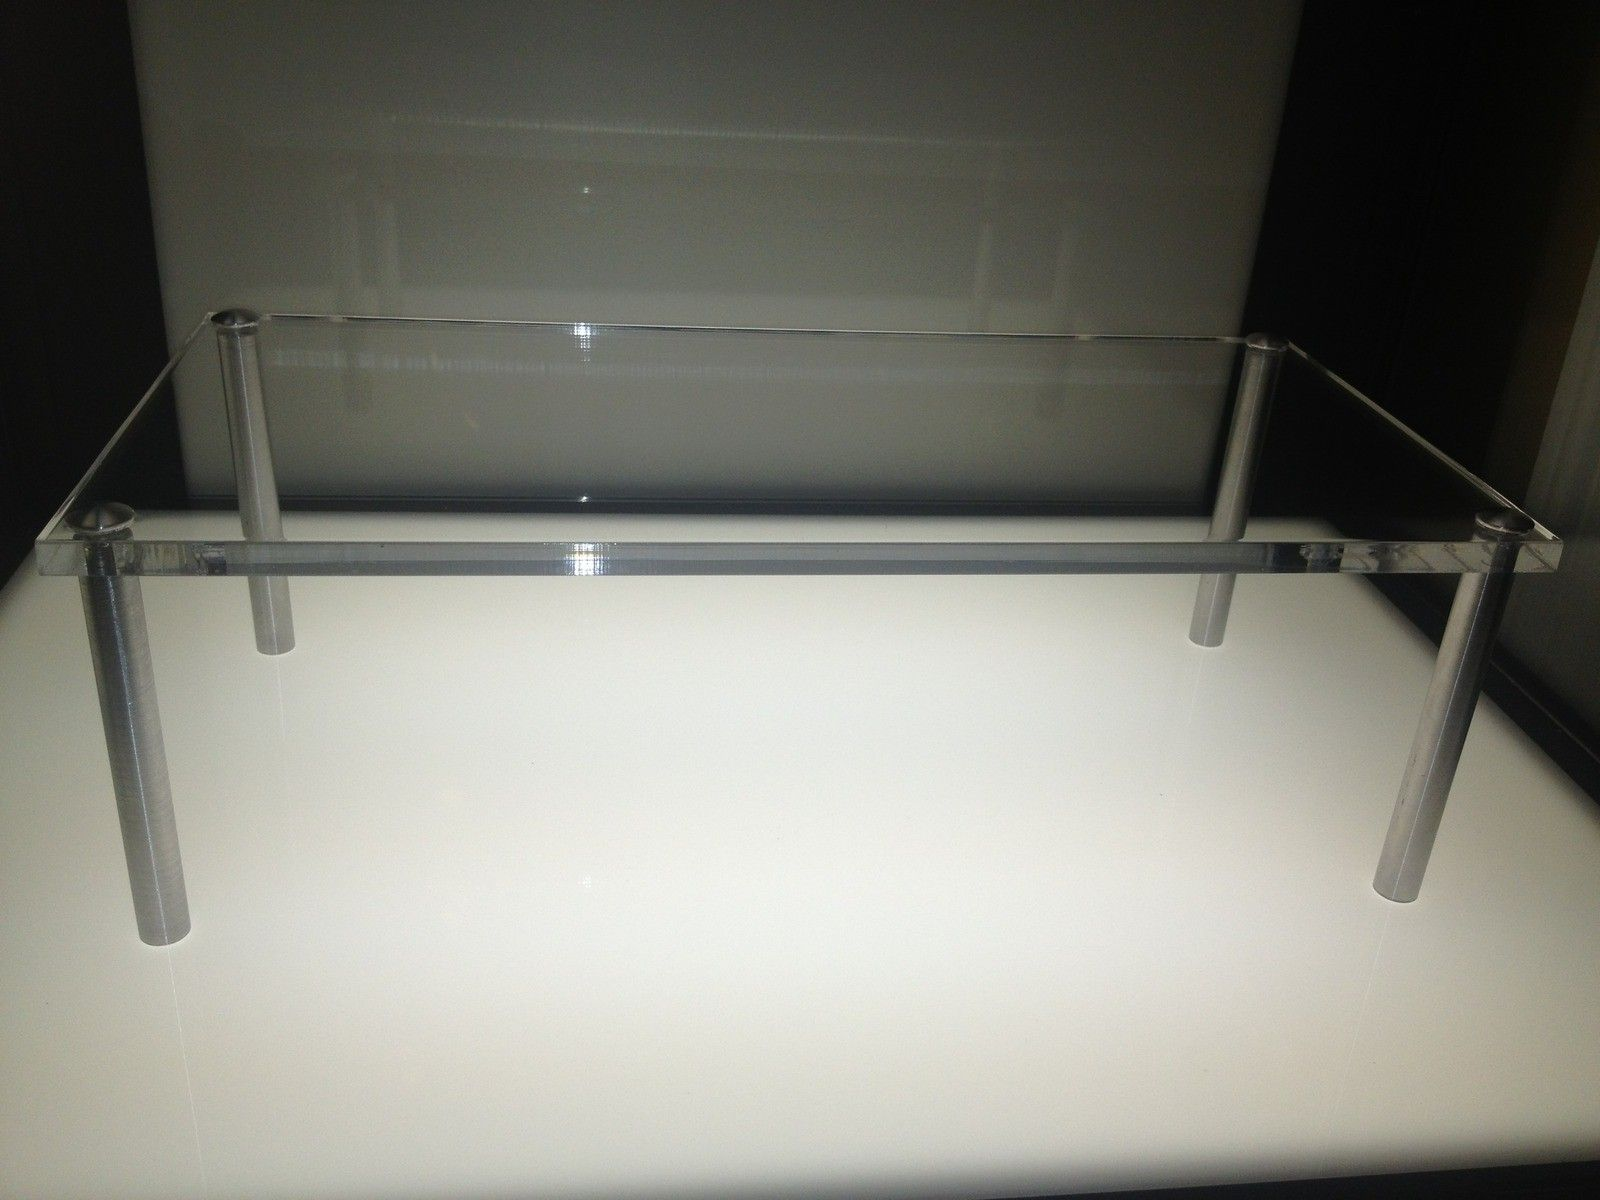 Brand New Oakley Acrylic Display Shelf $65.00 Shipped To USA - oakleyshelf01.jpg